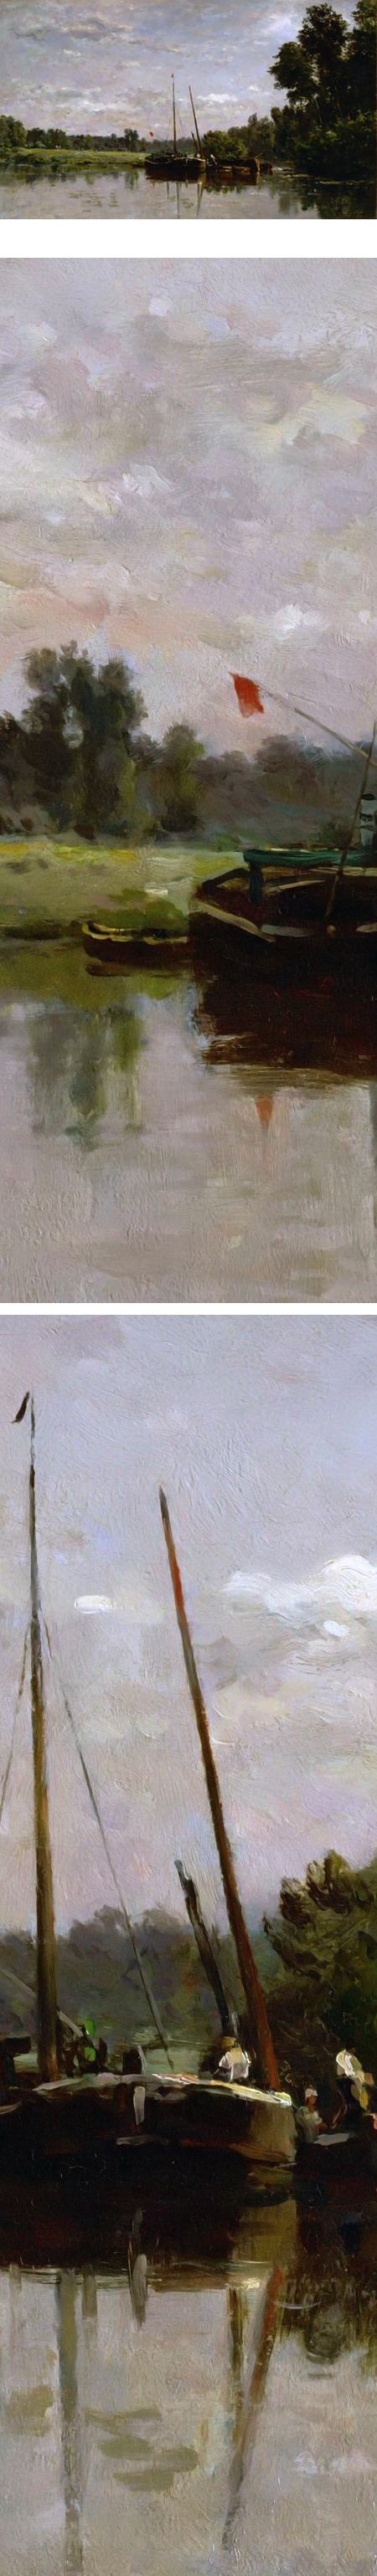 Les peniches, Charles-François Daubigny